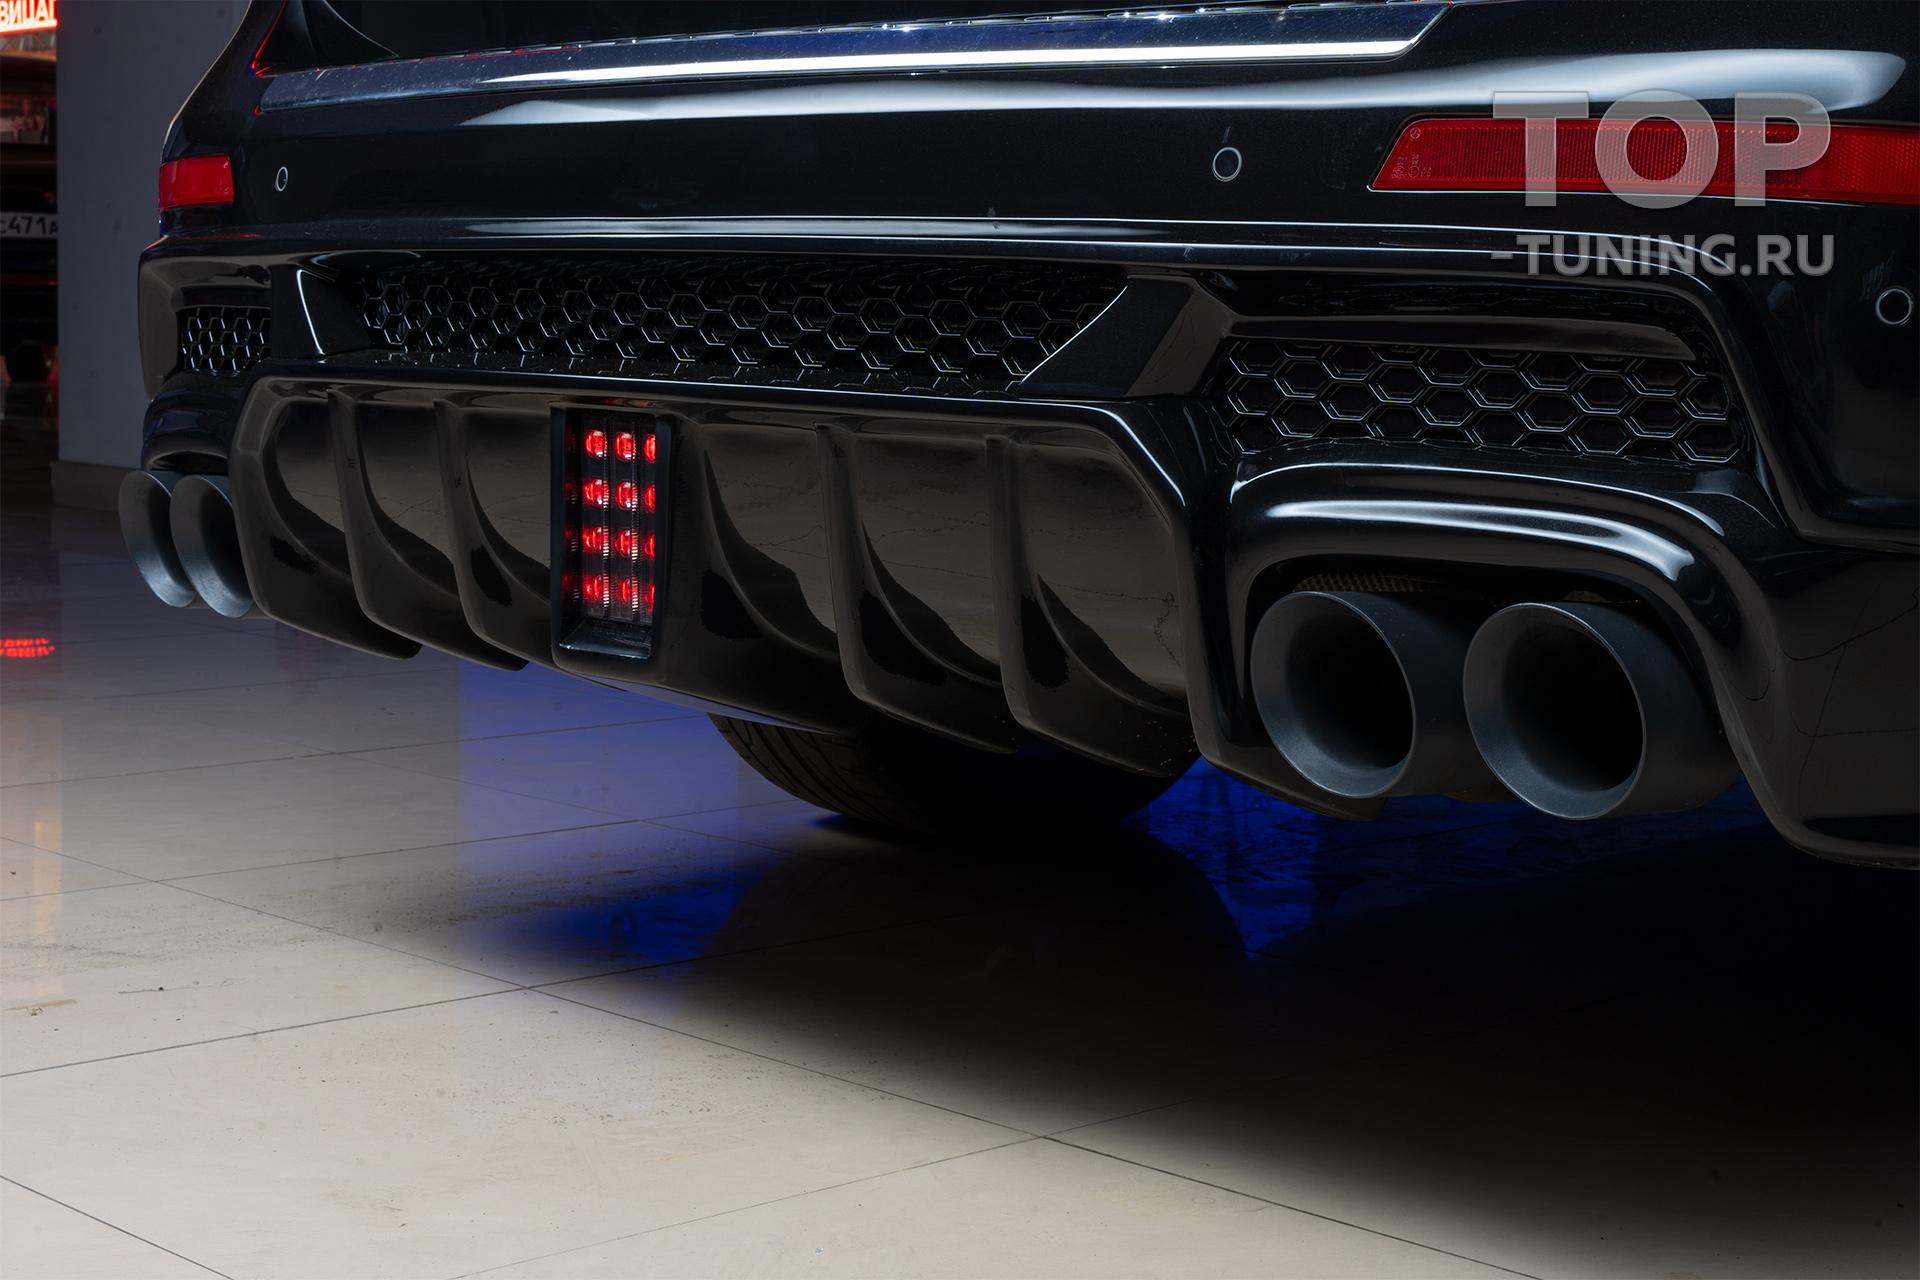 Задний бампер с диффузором - Обвес Renegade - Тюнинг GL X166